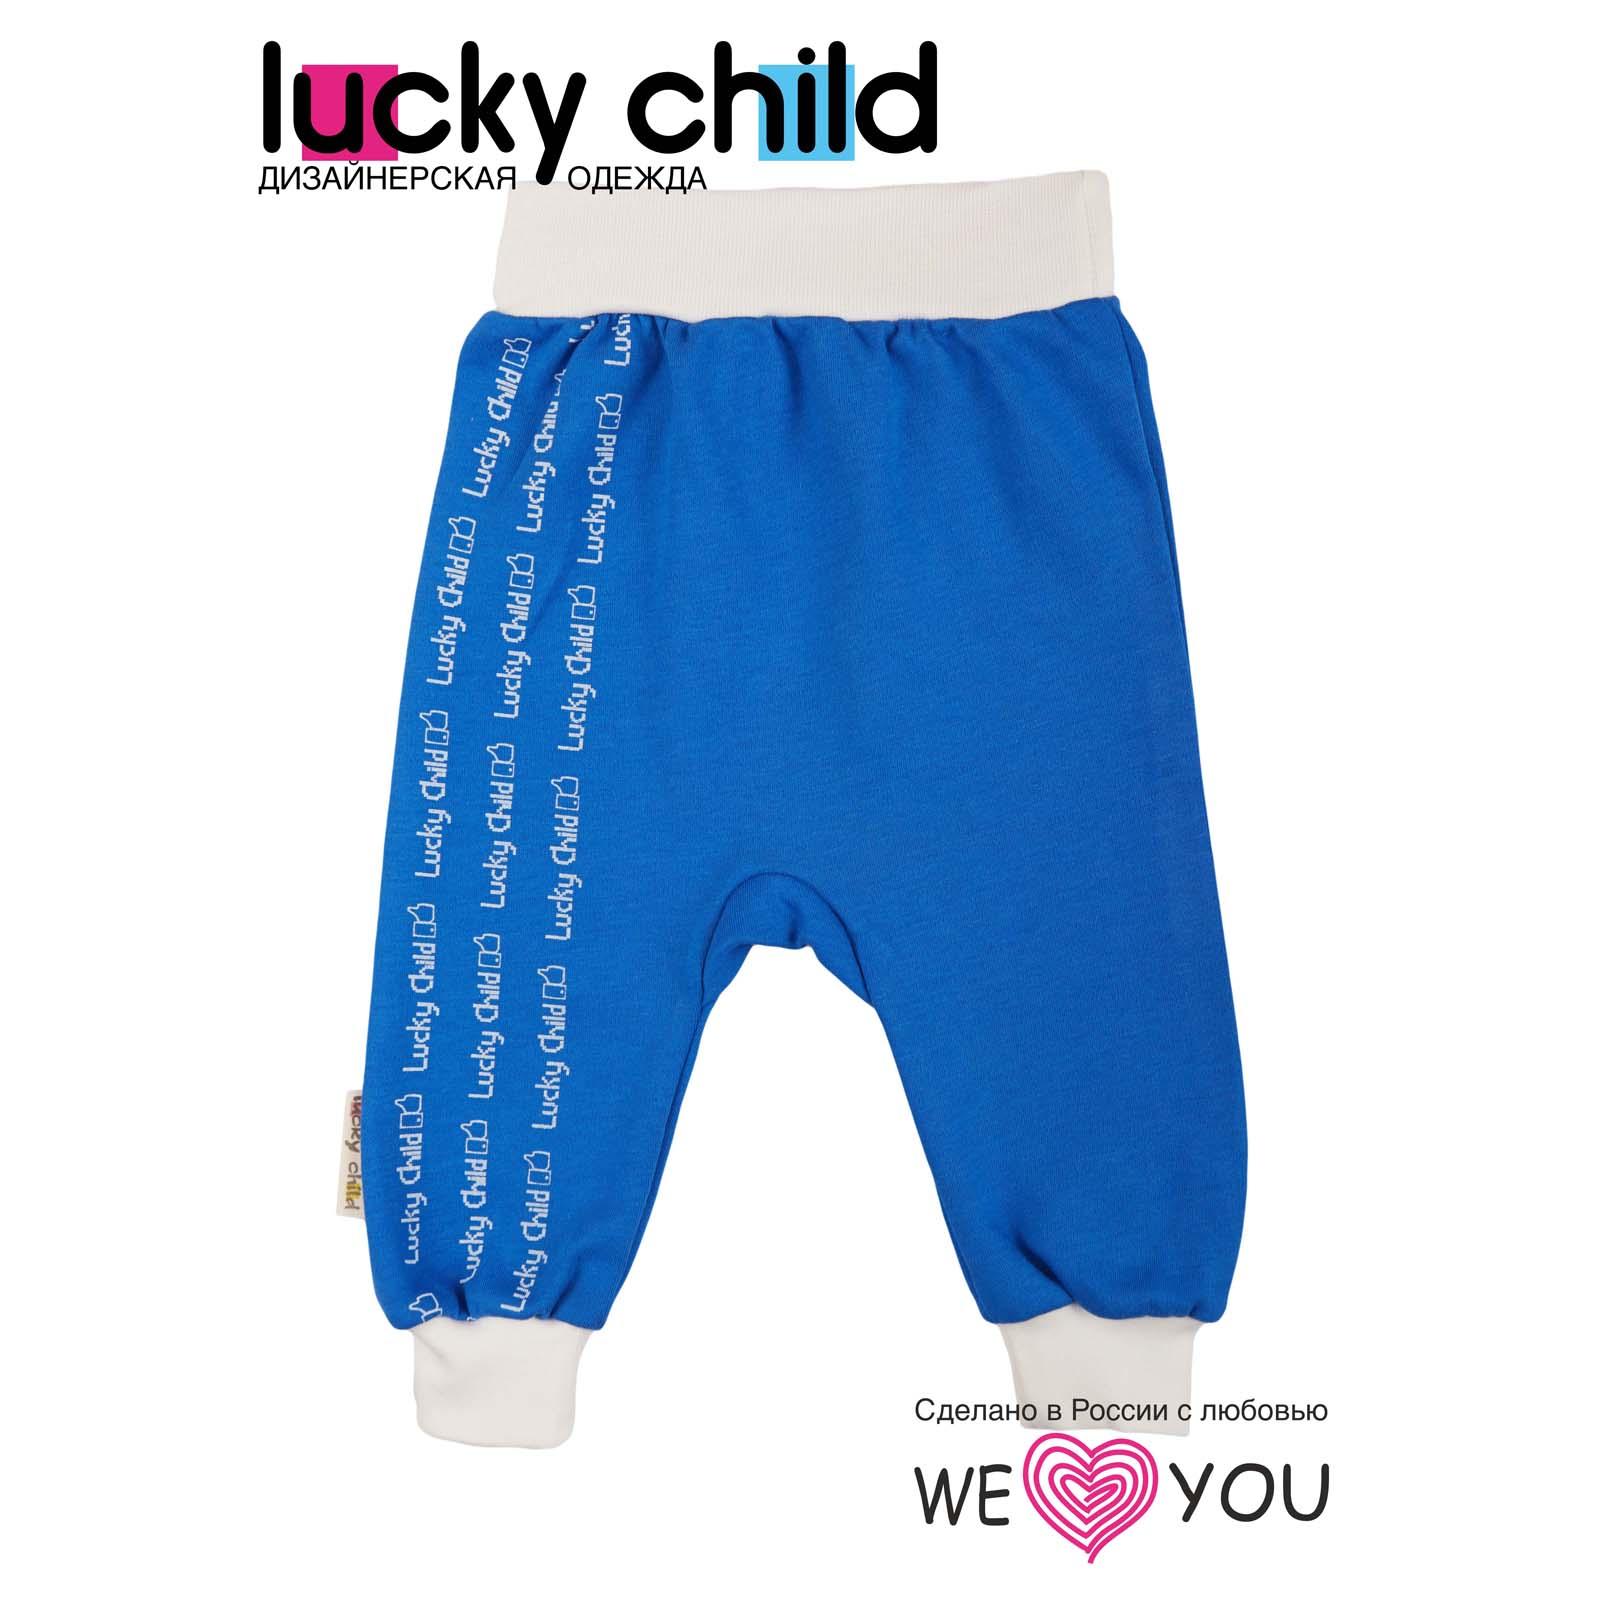 Штанишки Lucky Child, коллекция Интернет, цвет синий с белым размер 56<br>